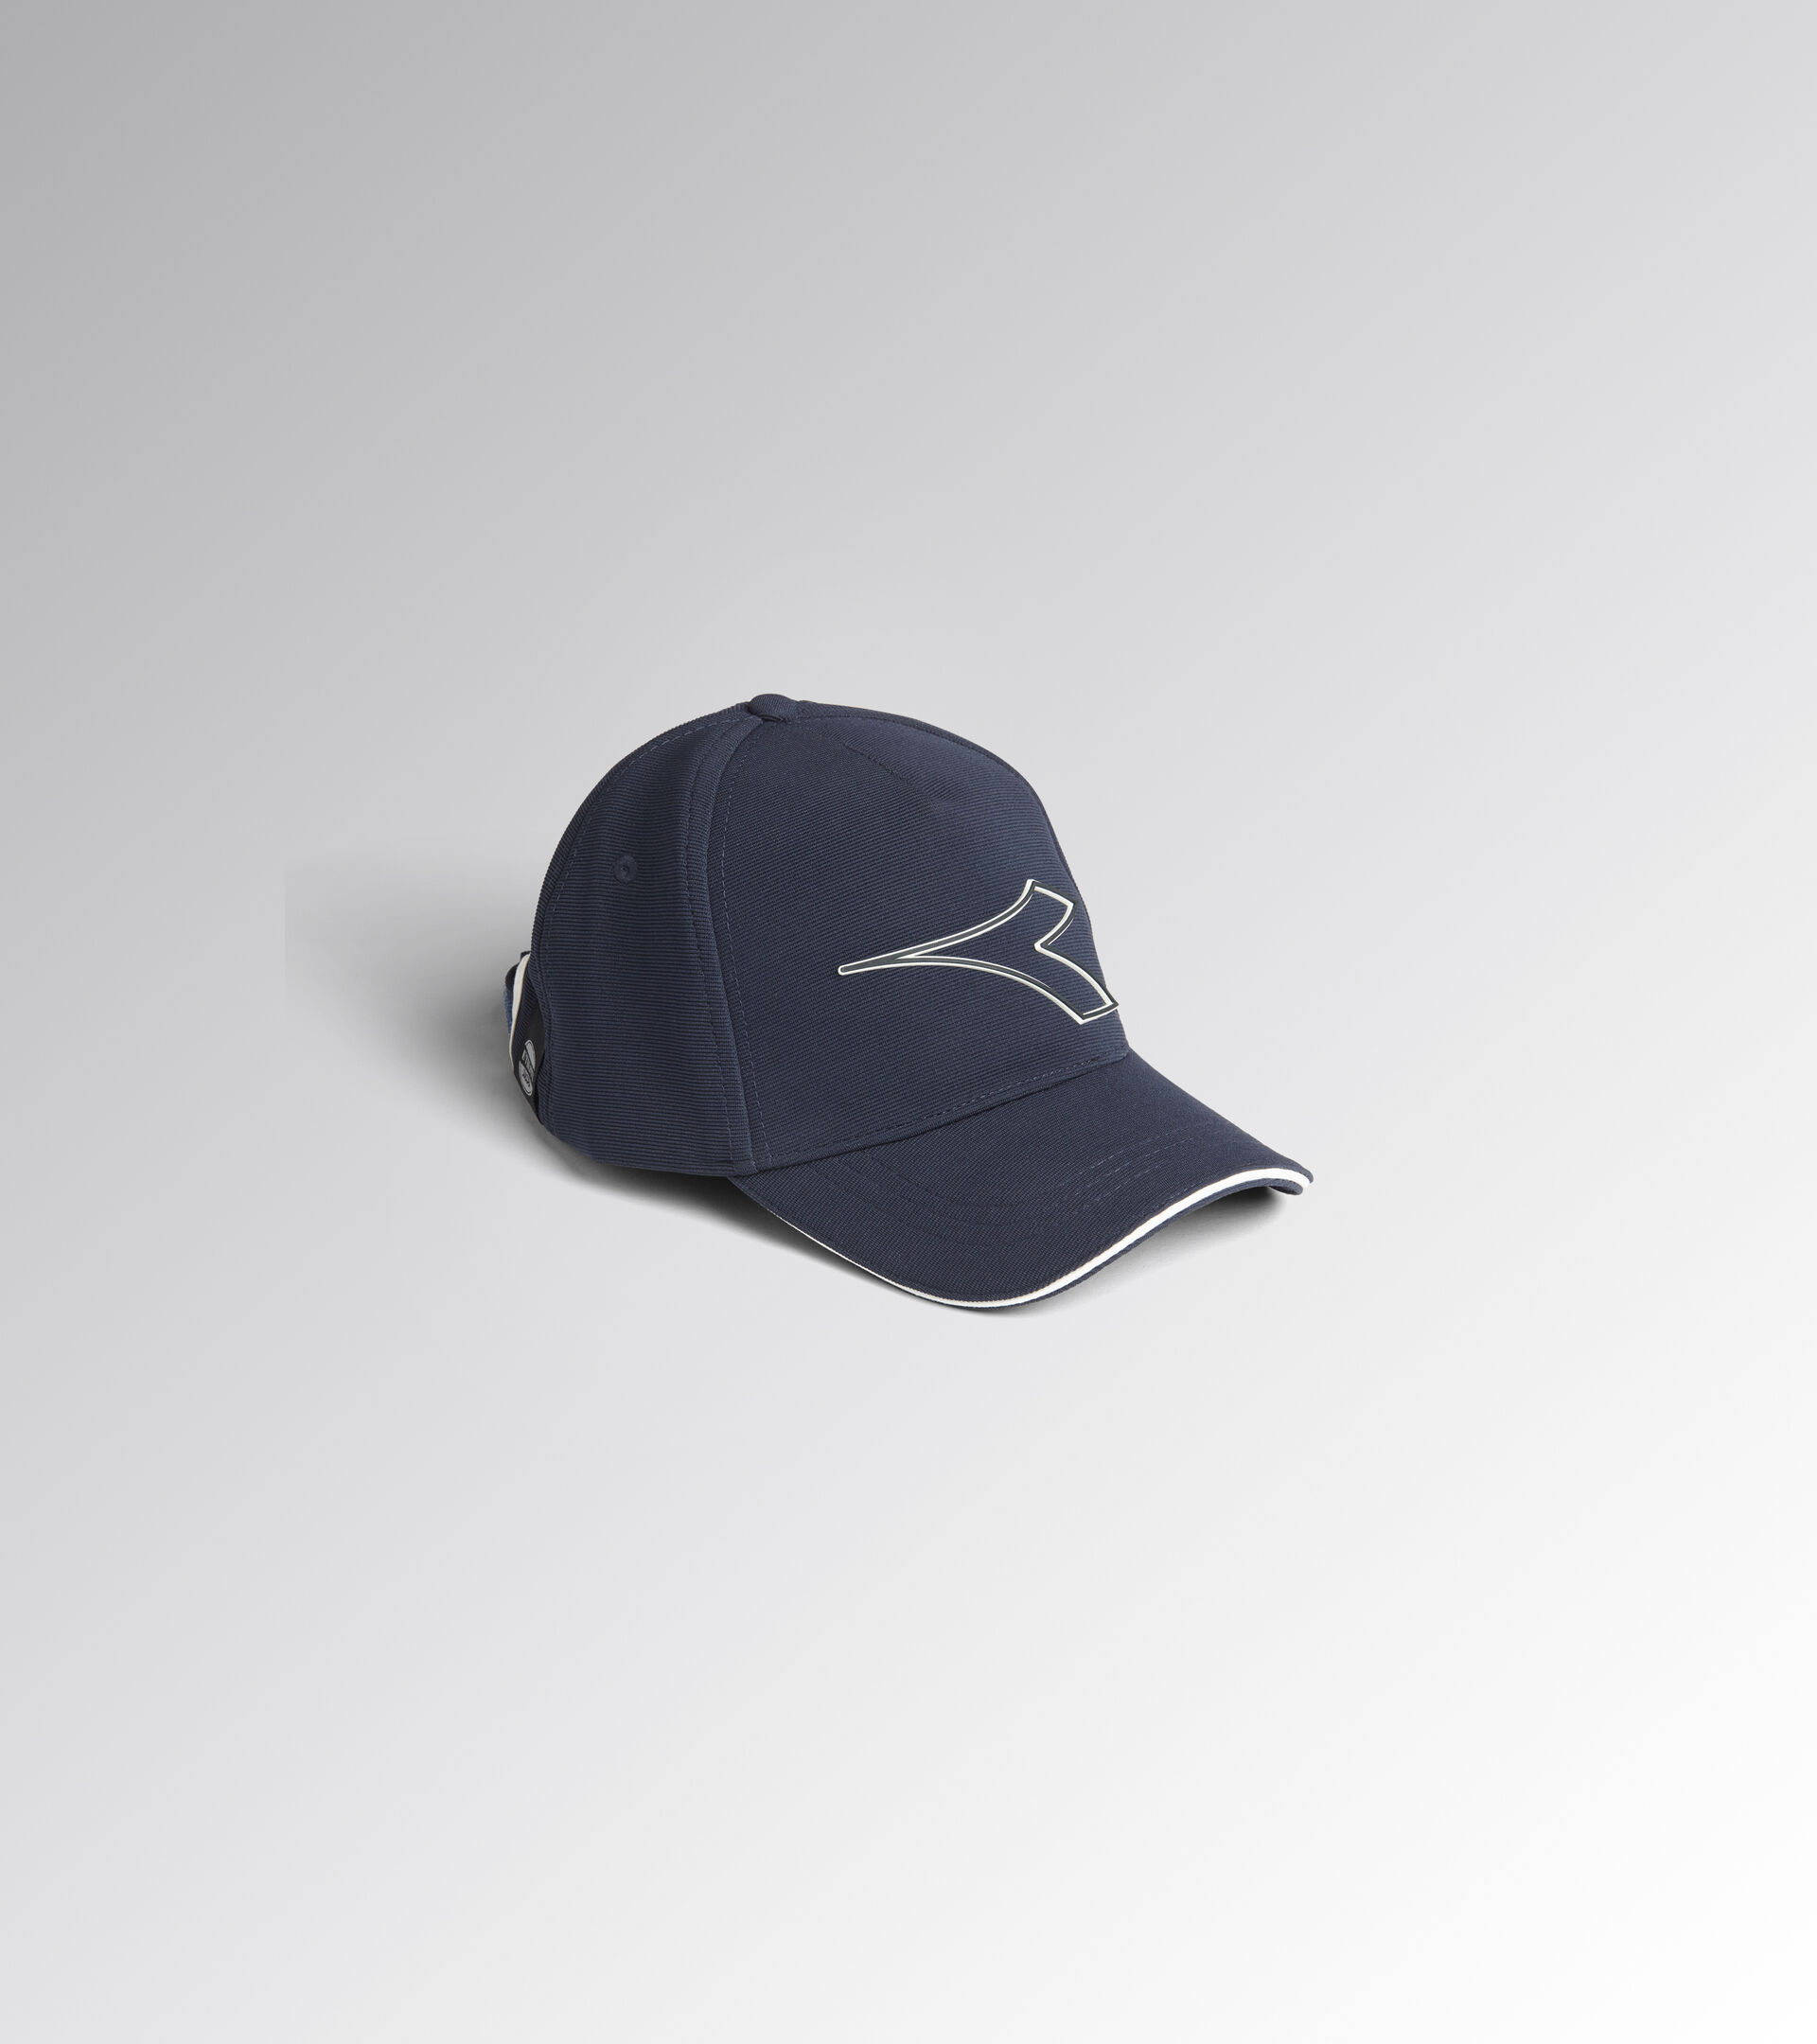 Accessories Utility UNISEX BASEBALL CAP BLUE CORSAIR Utility